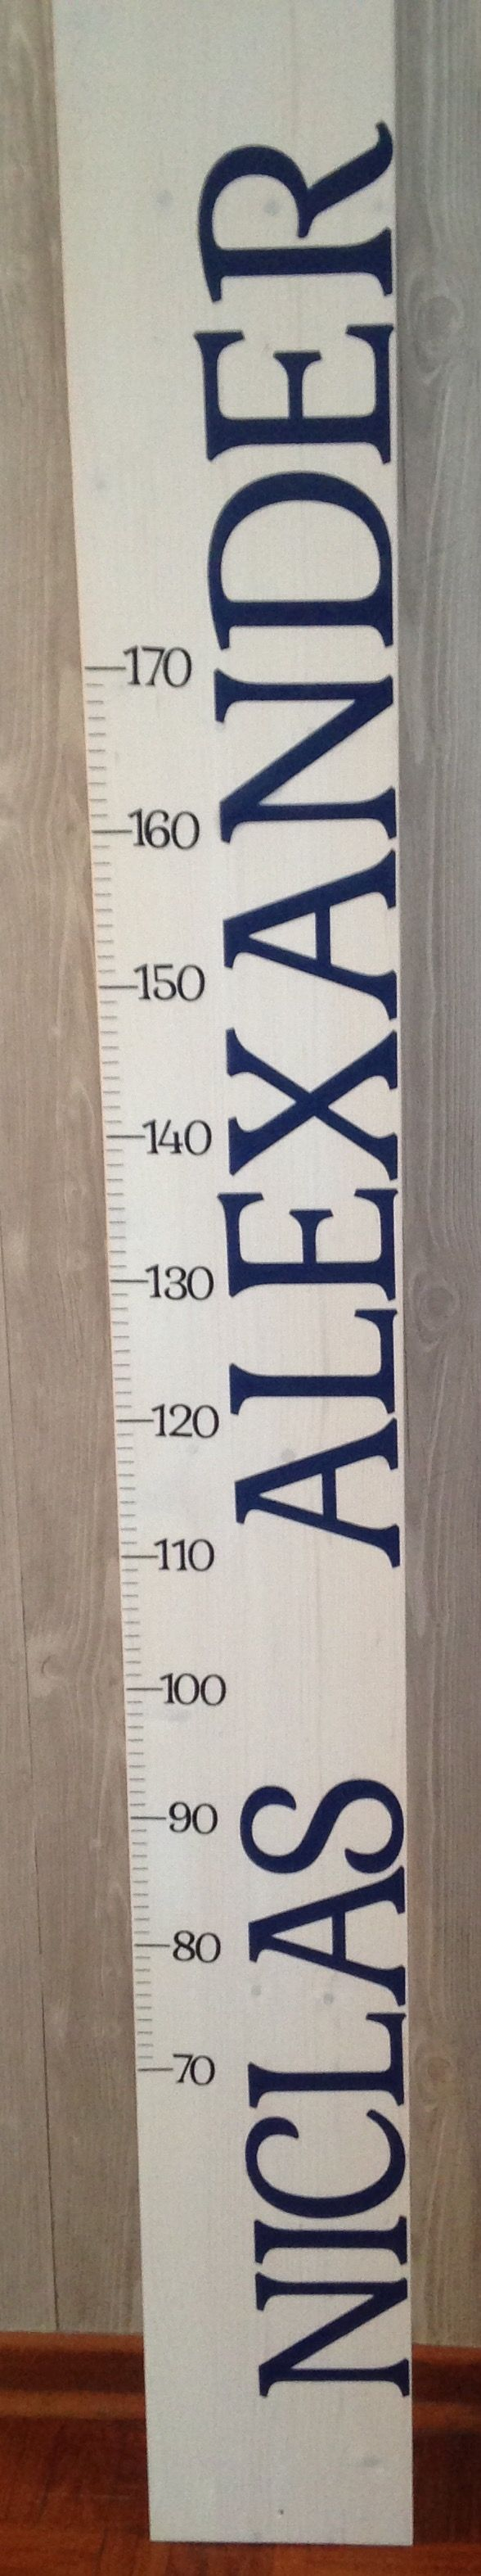 larissaswelt kindermesslatte Oktober 2015  NICLAS ALEXANDER 180cm Desig 3 Farbe: dunkelblau